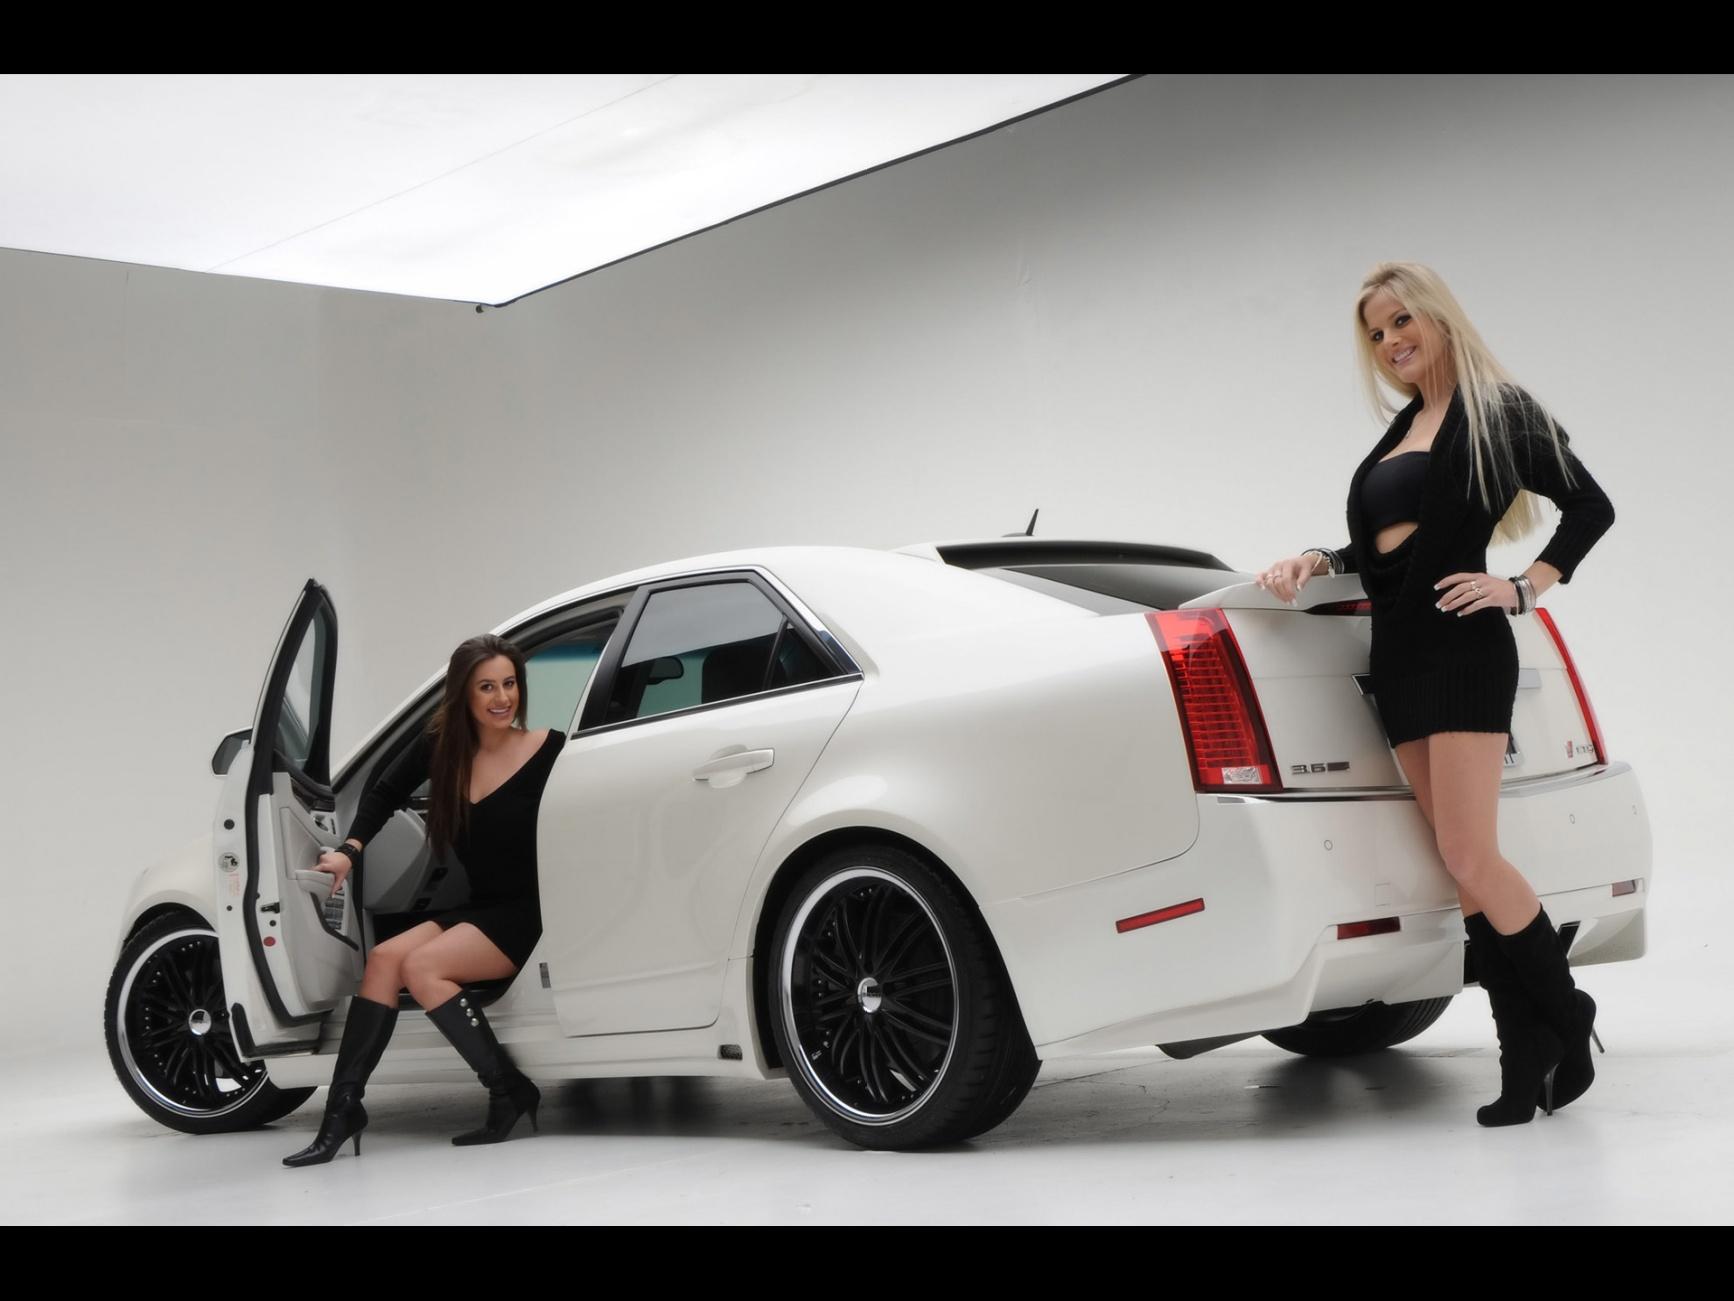 Cadillac CTS - 1734x1301